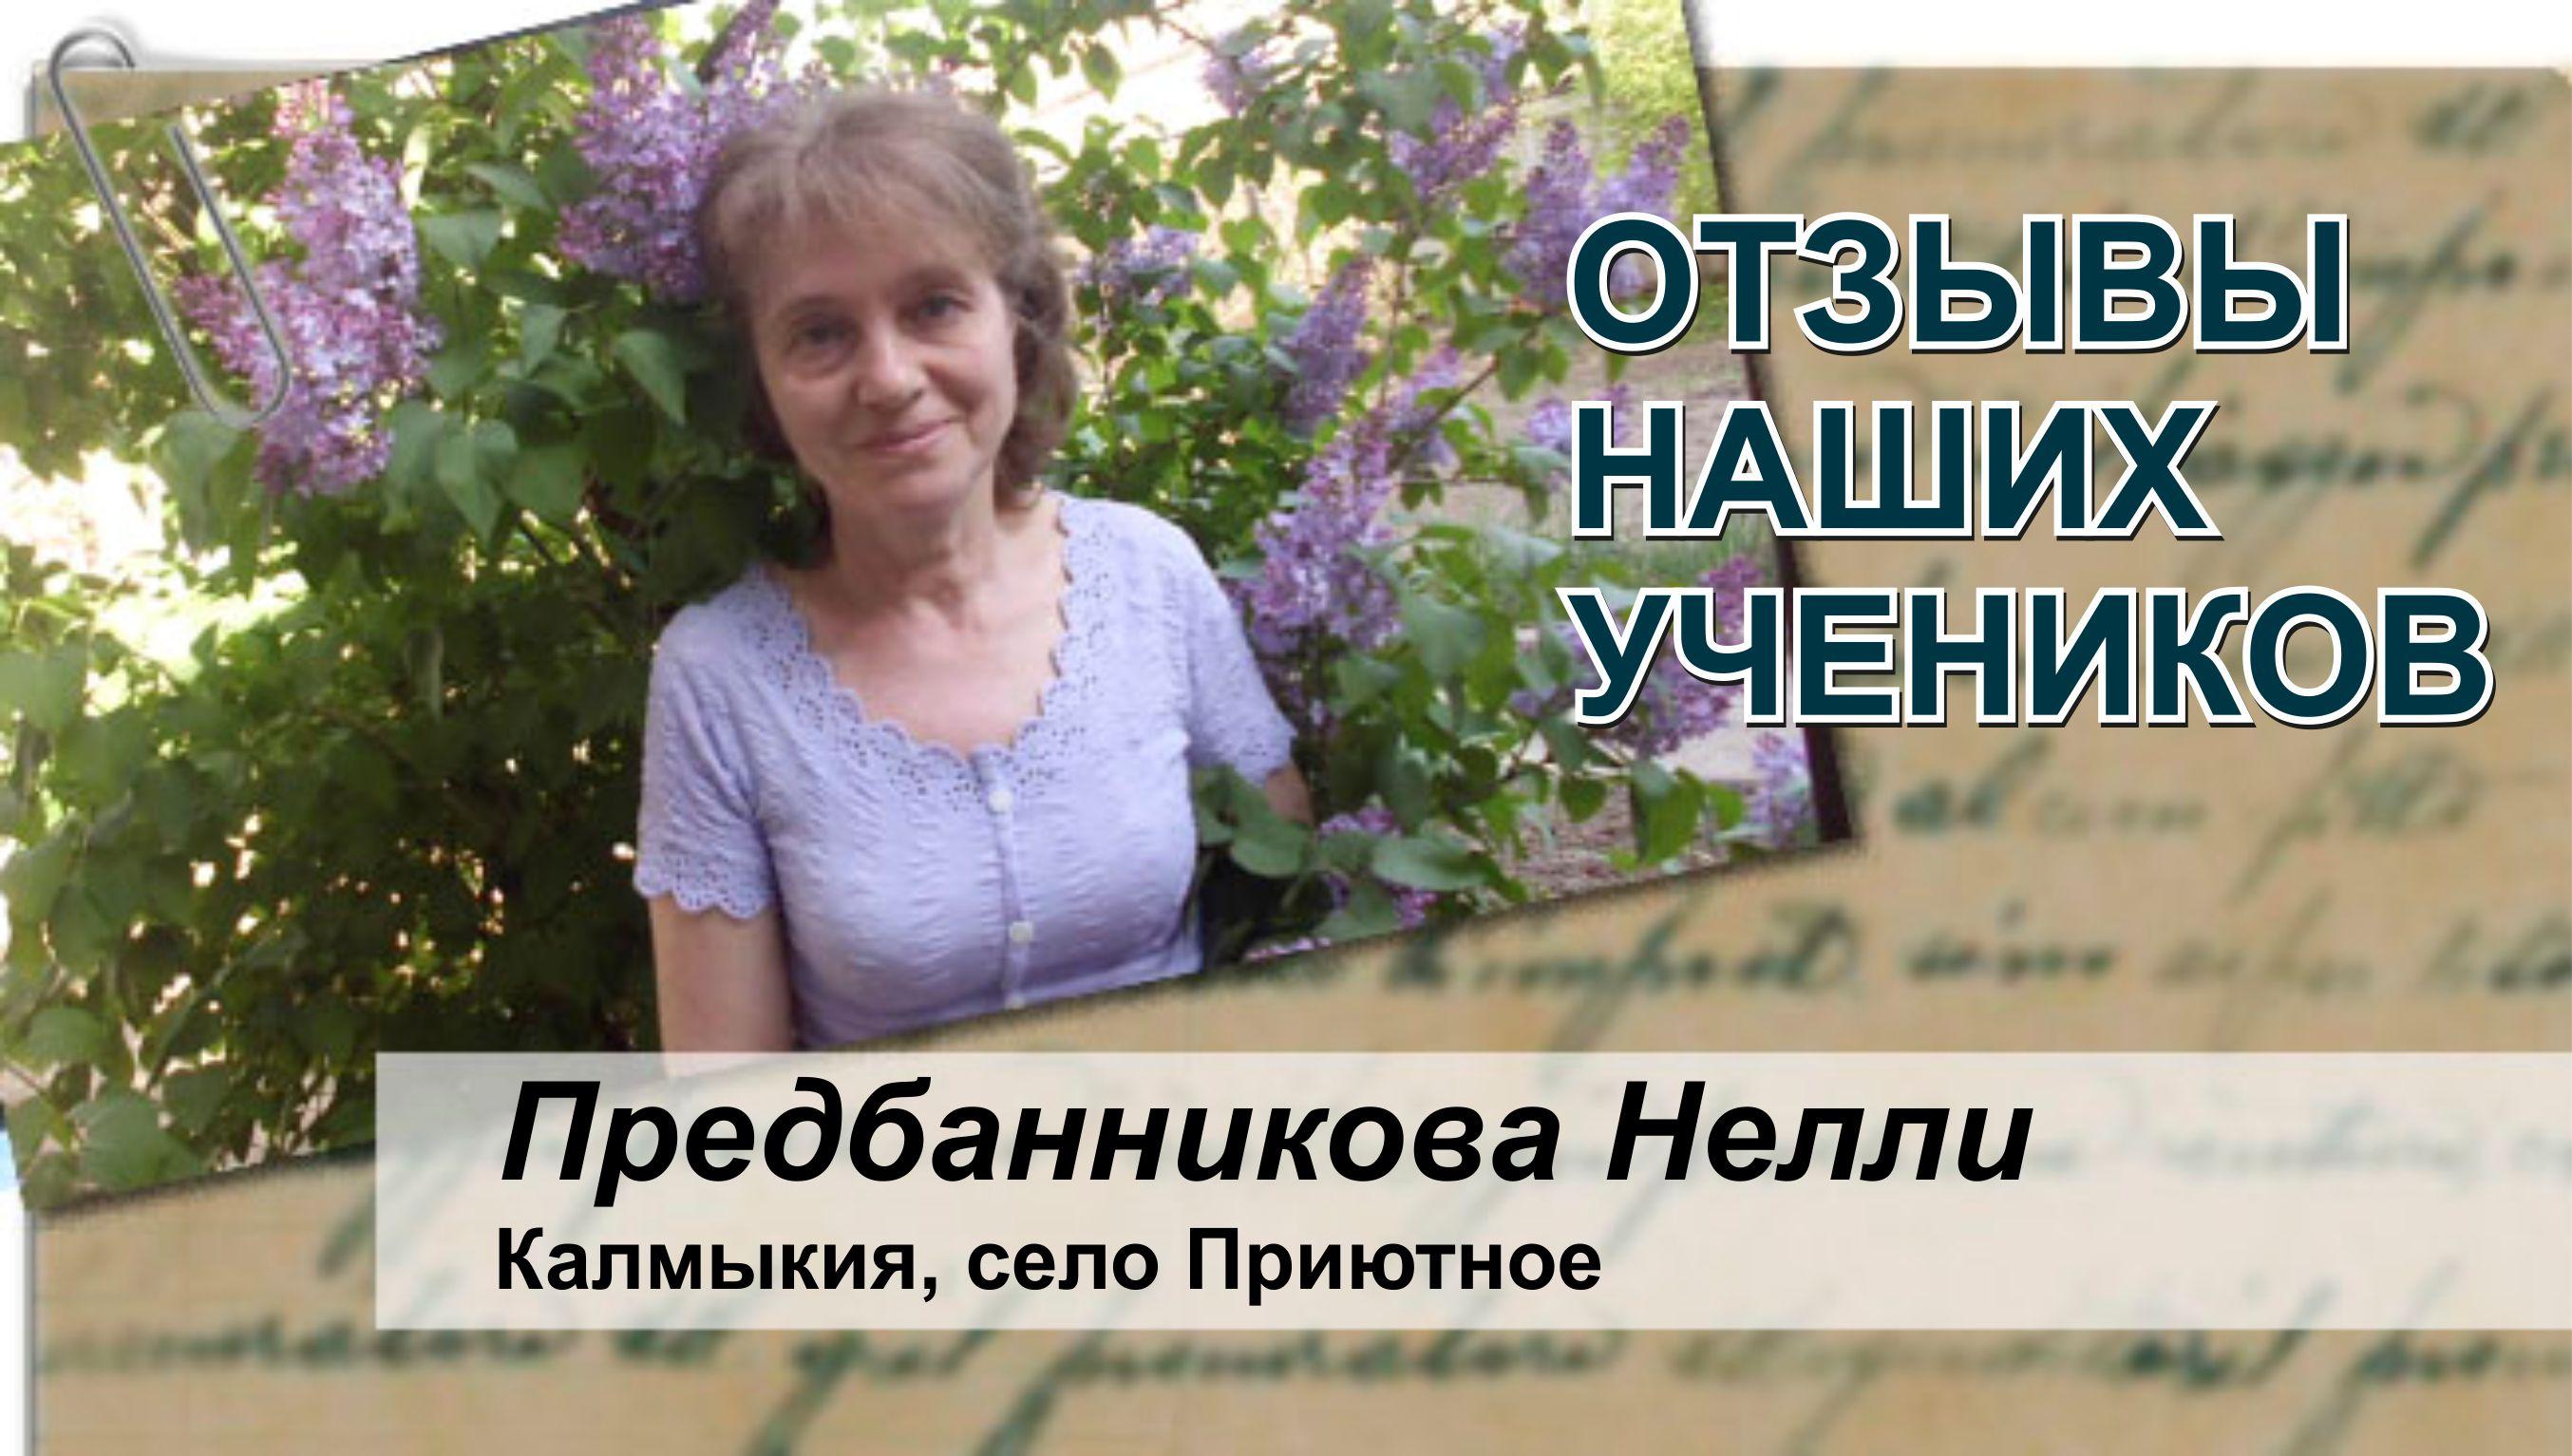 Предбанникова Нелли отзыв Таро Старт